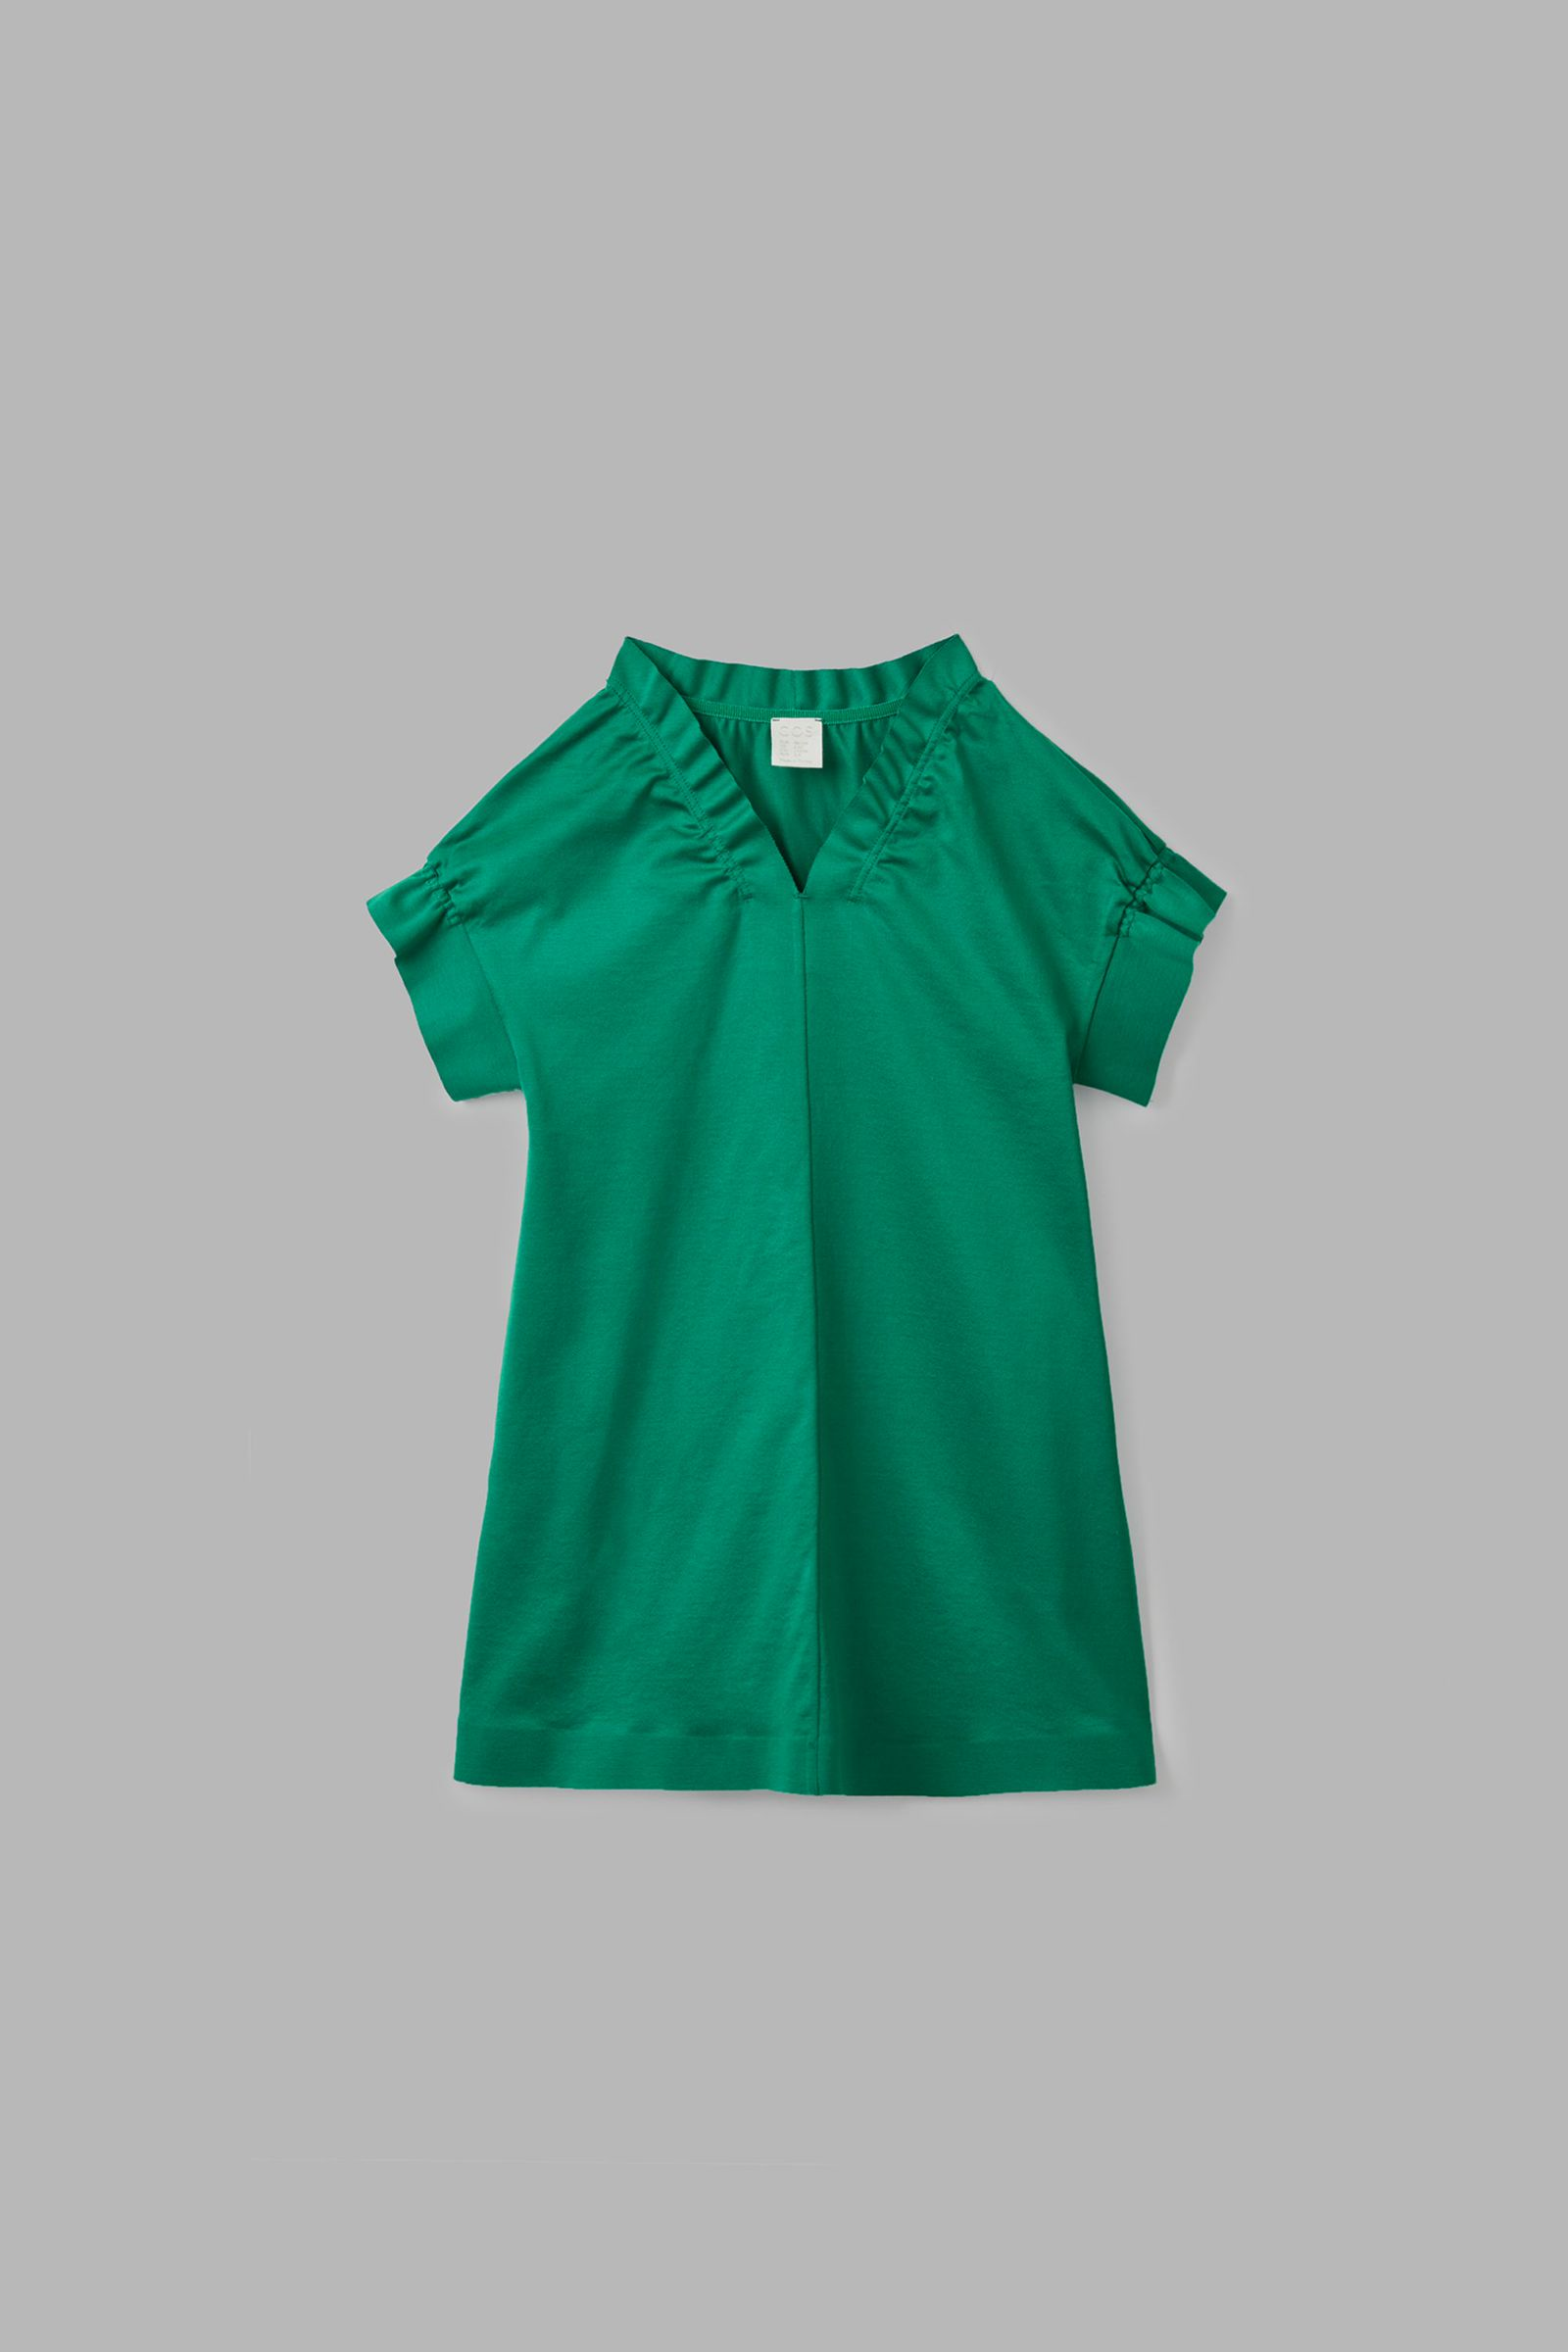 COS 루쉬 트림드 드레스의 그린컬러 Product입니다.